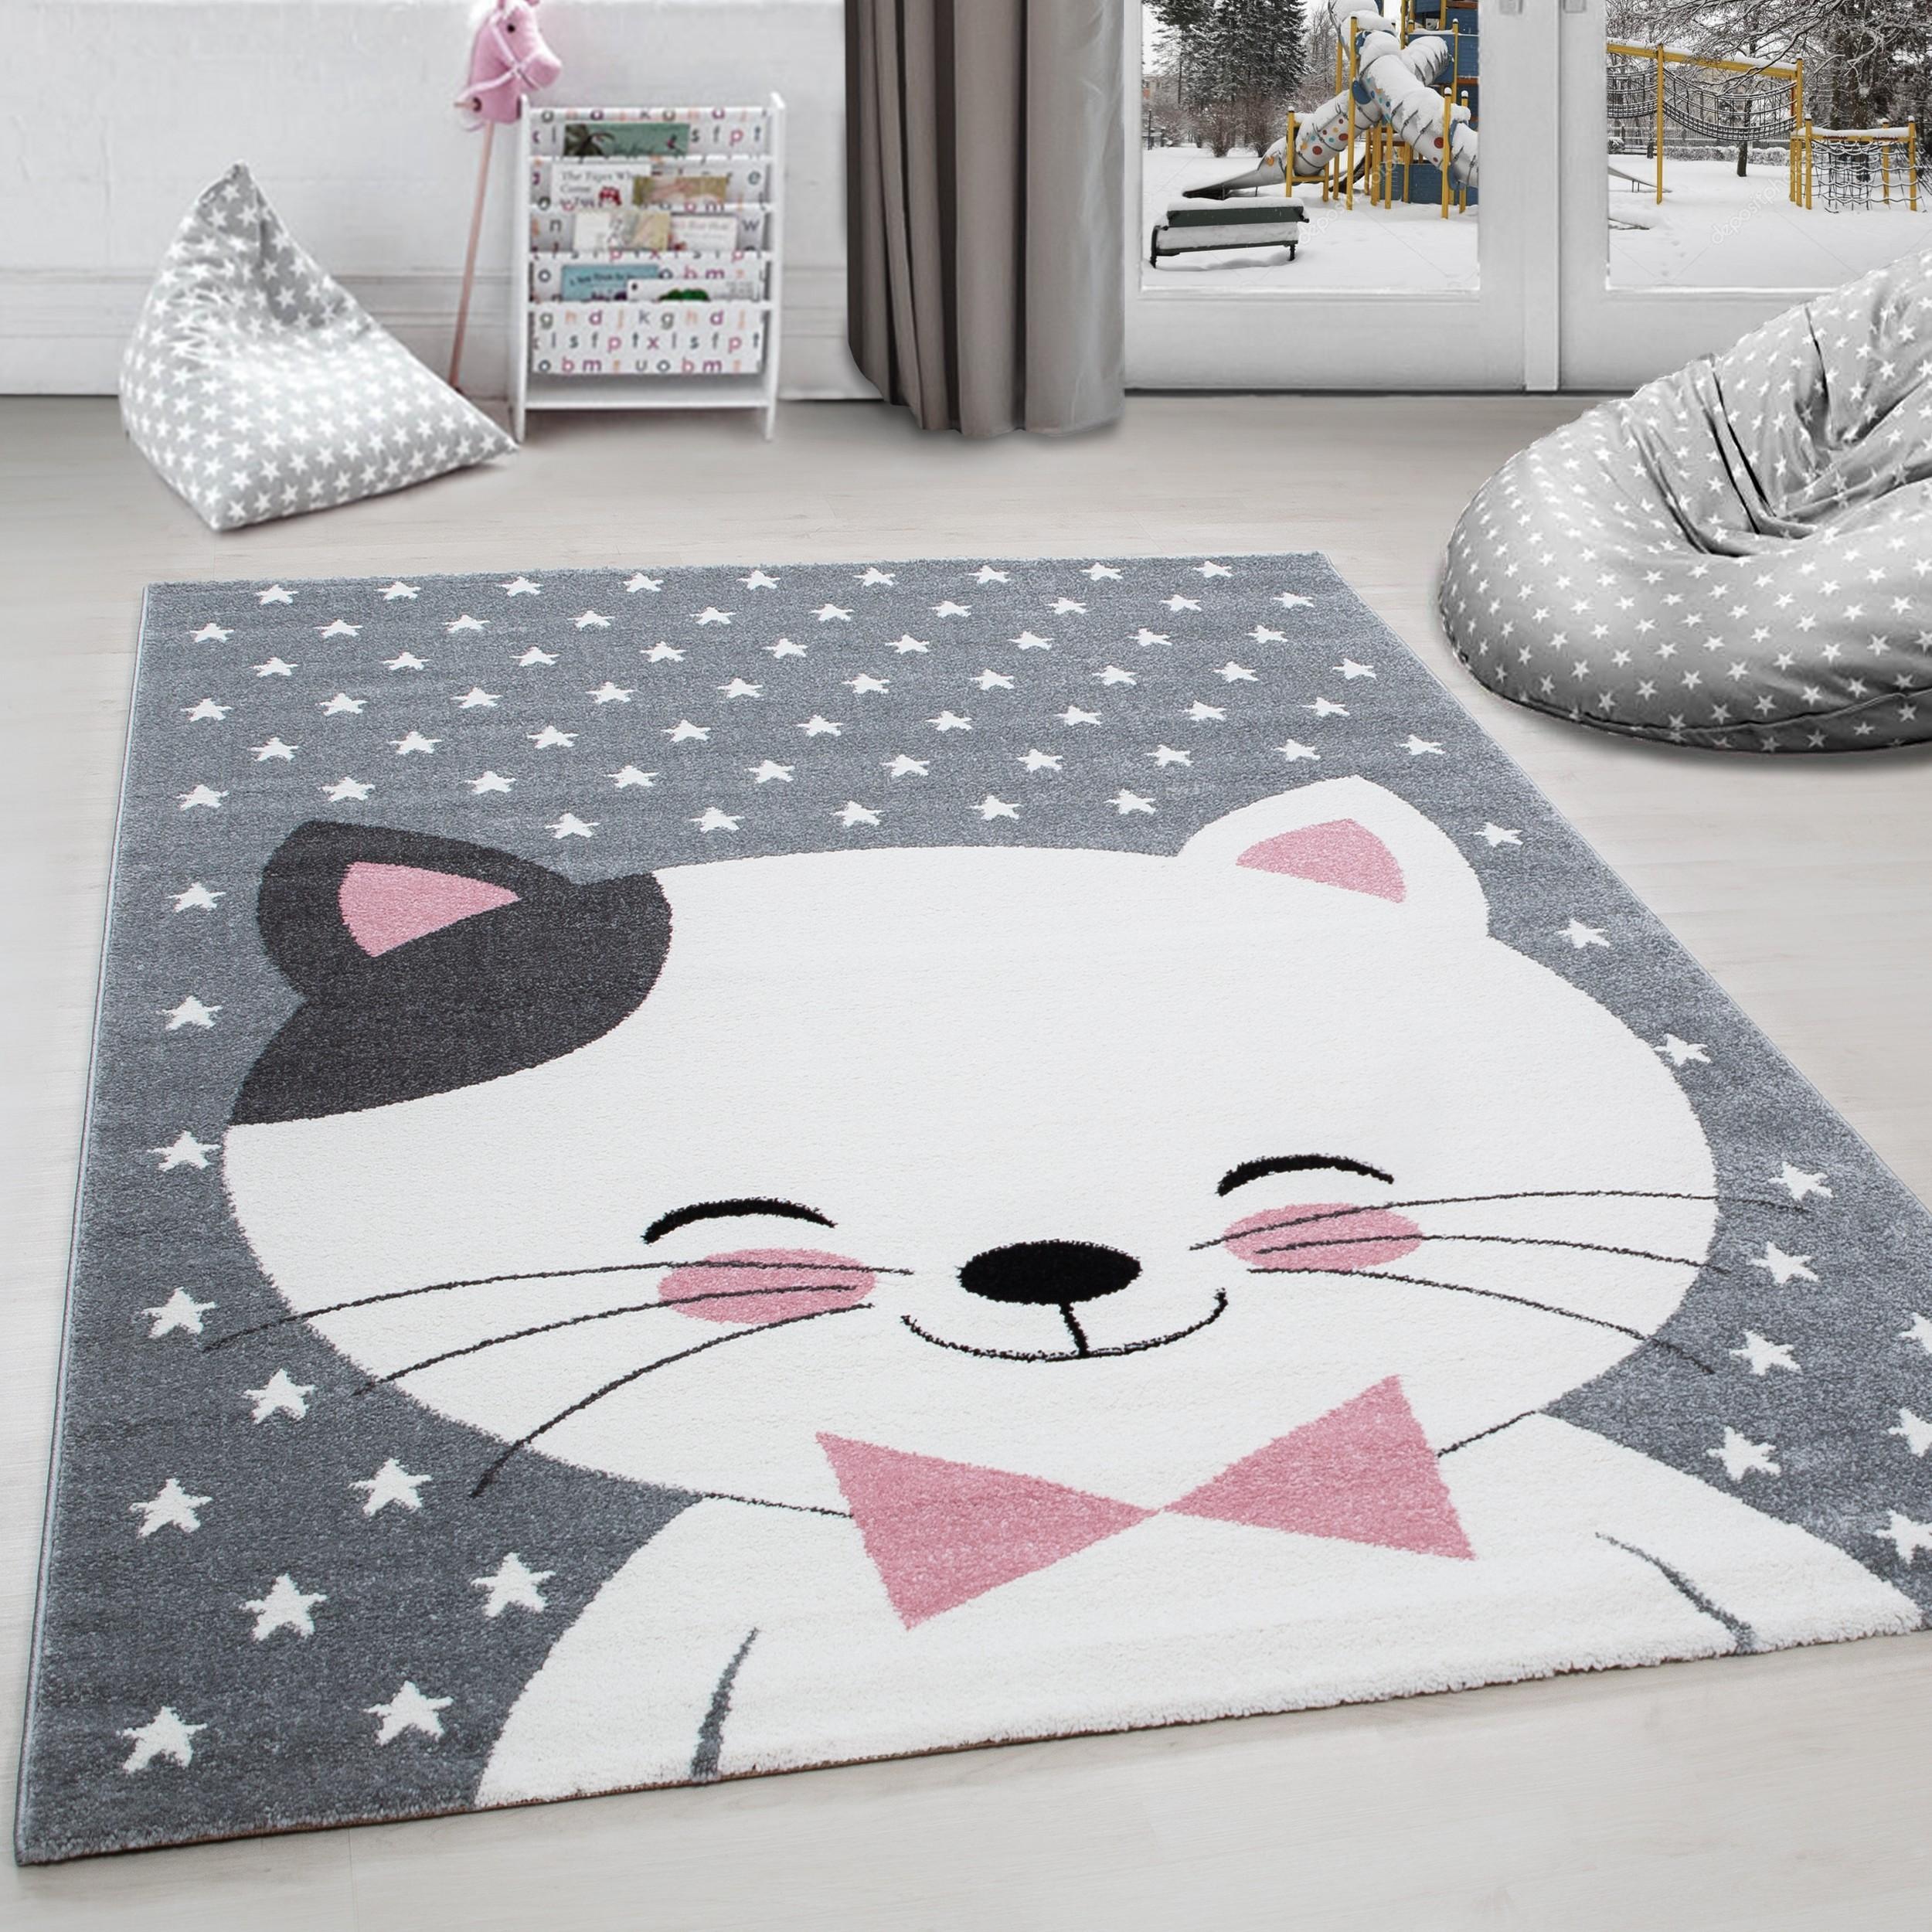 Full Size of Kinderzimmer Teppiche Kinderteppich Teppich Katze Sternmotiv Grau Wei Pink Regale Sofa Wohnzimmer Regal Weiß Kinderzimmer Kinderzimmer Teppiche